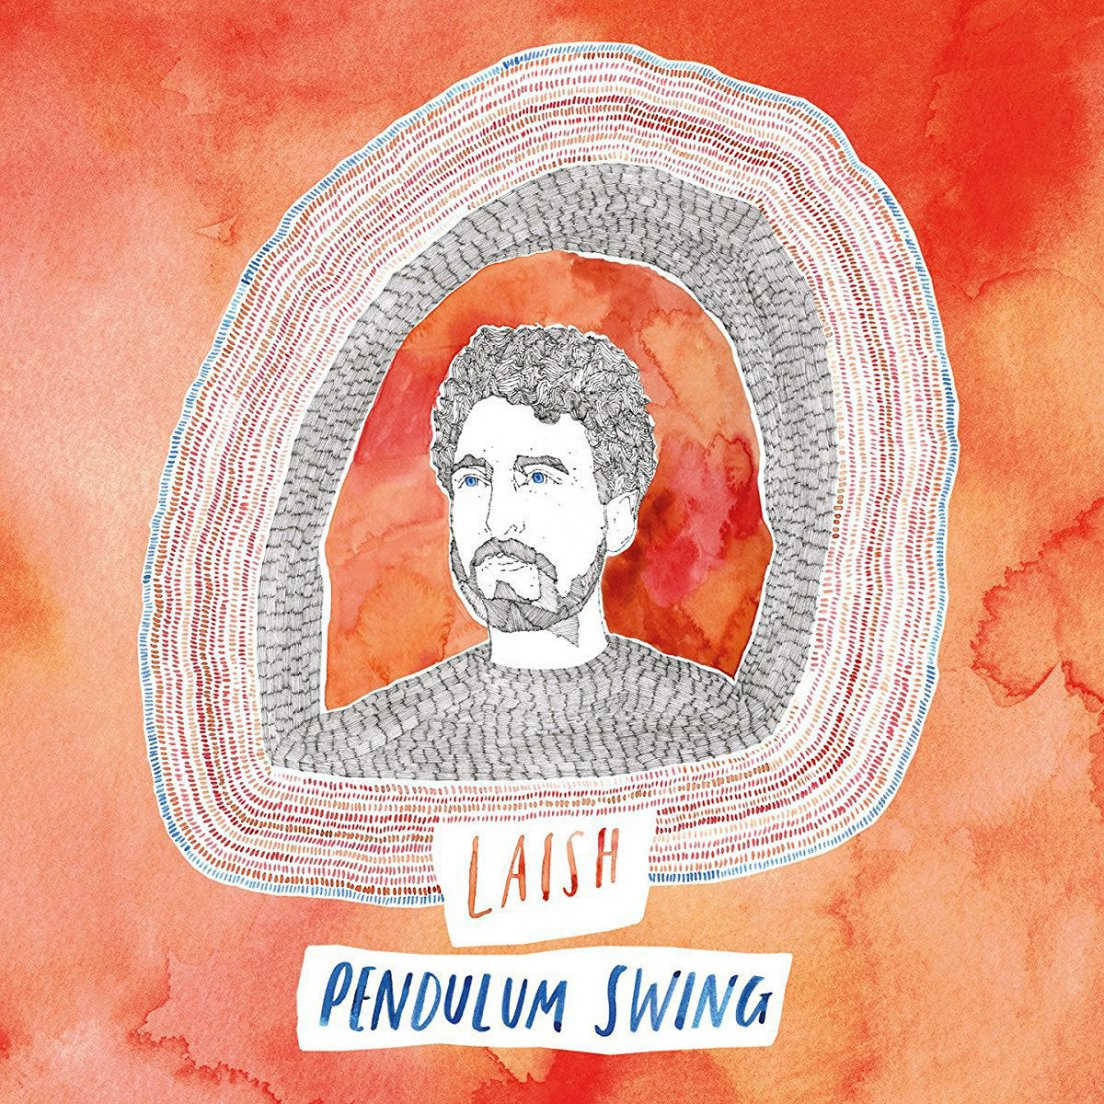 Laish - Pendulum Swing